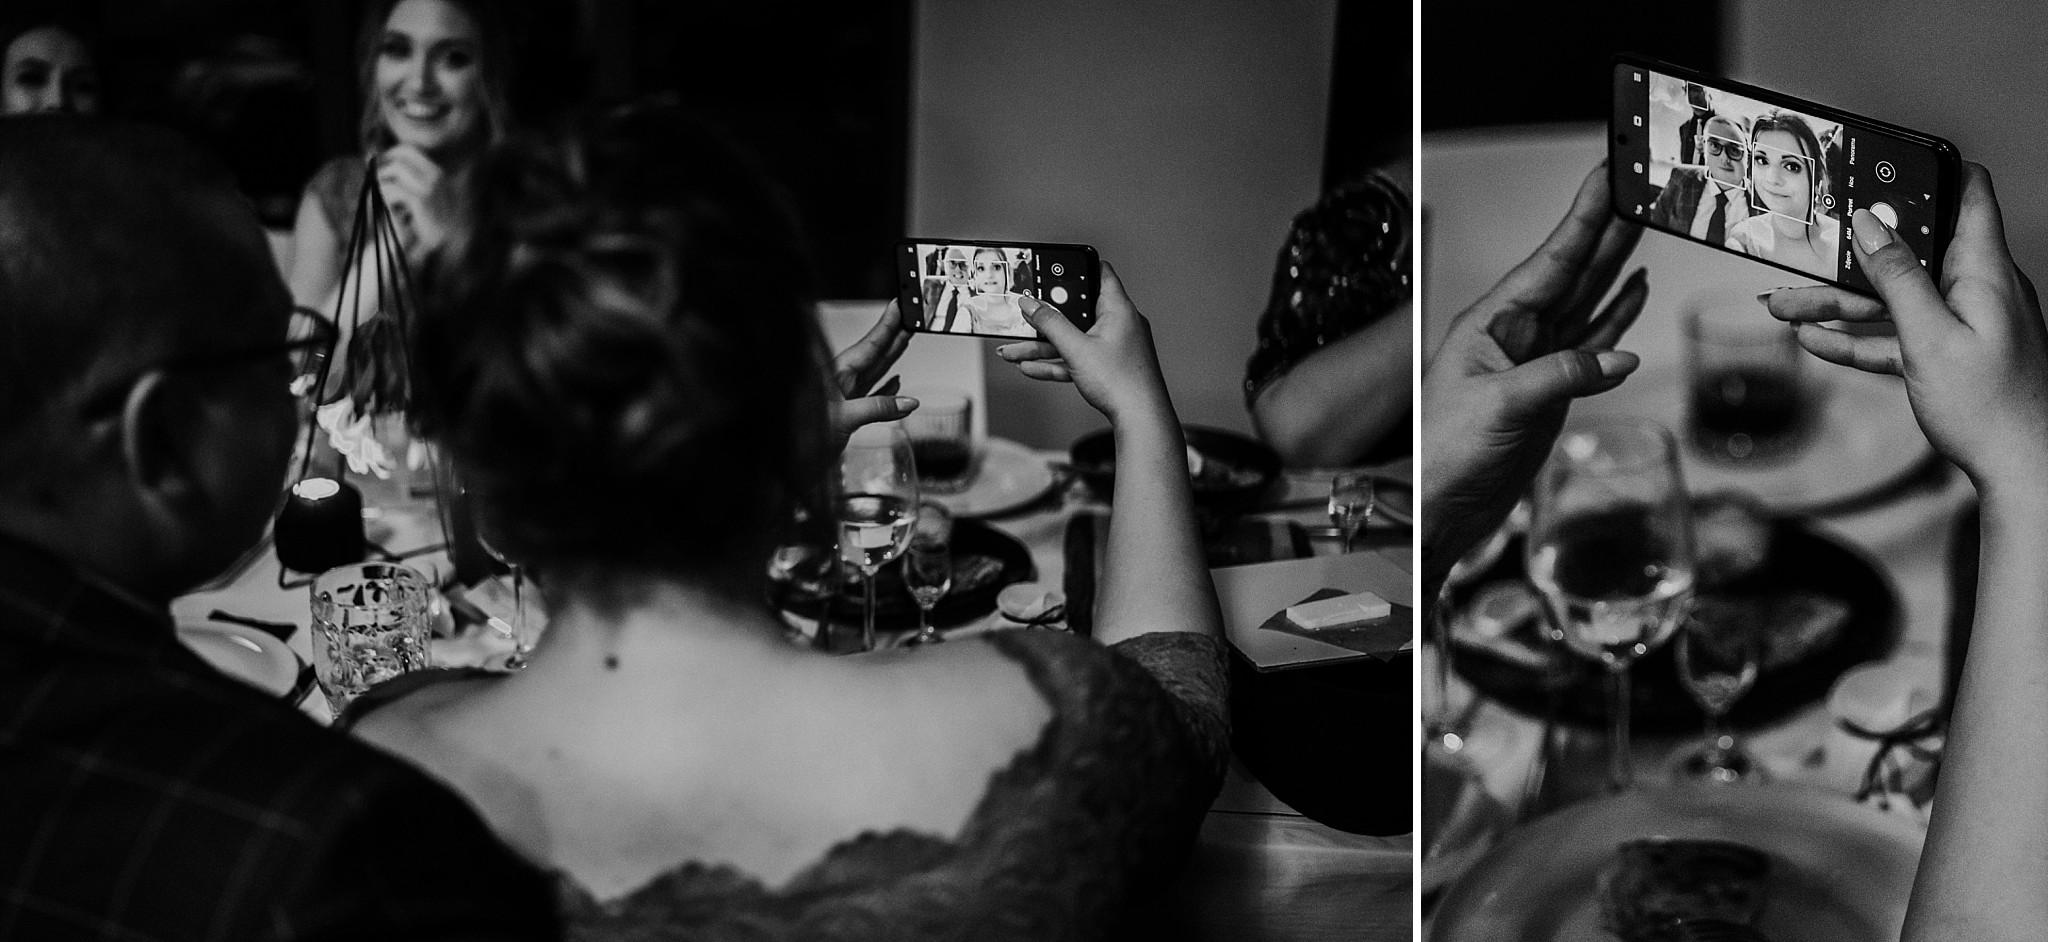 fotograf poznan wesele dobra truskawka piekne wesele pod poznaniem wesele w dobrej truskawce piekna para mloda slub marzen slub koronawirus slub listopad wesele koronawirus 492